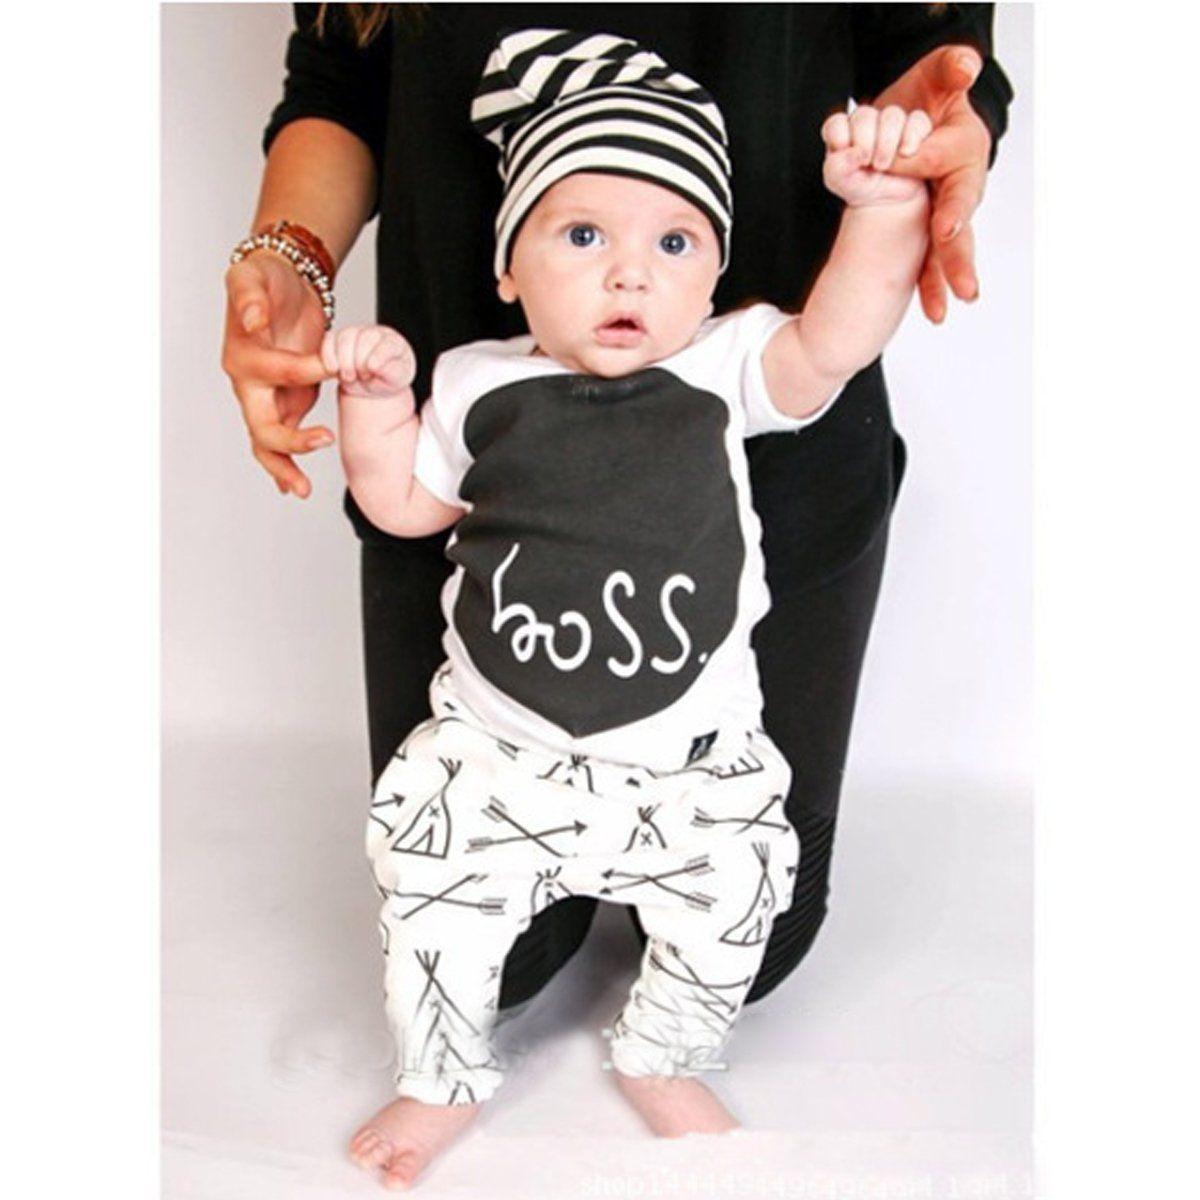 2pcs Newborn Toddler Kids Baby Boys Clothes Cotton T-shirt Tops+Pants Outfit Set